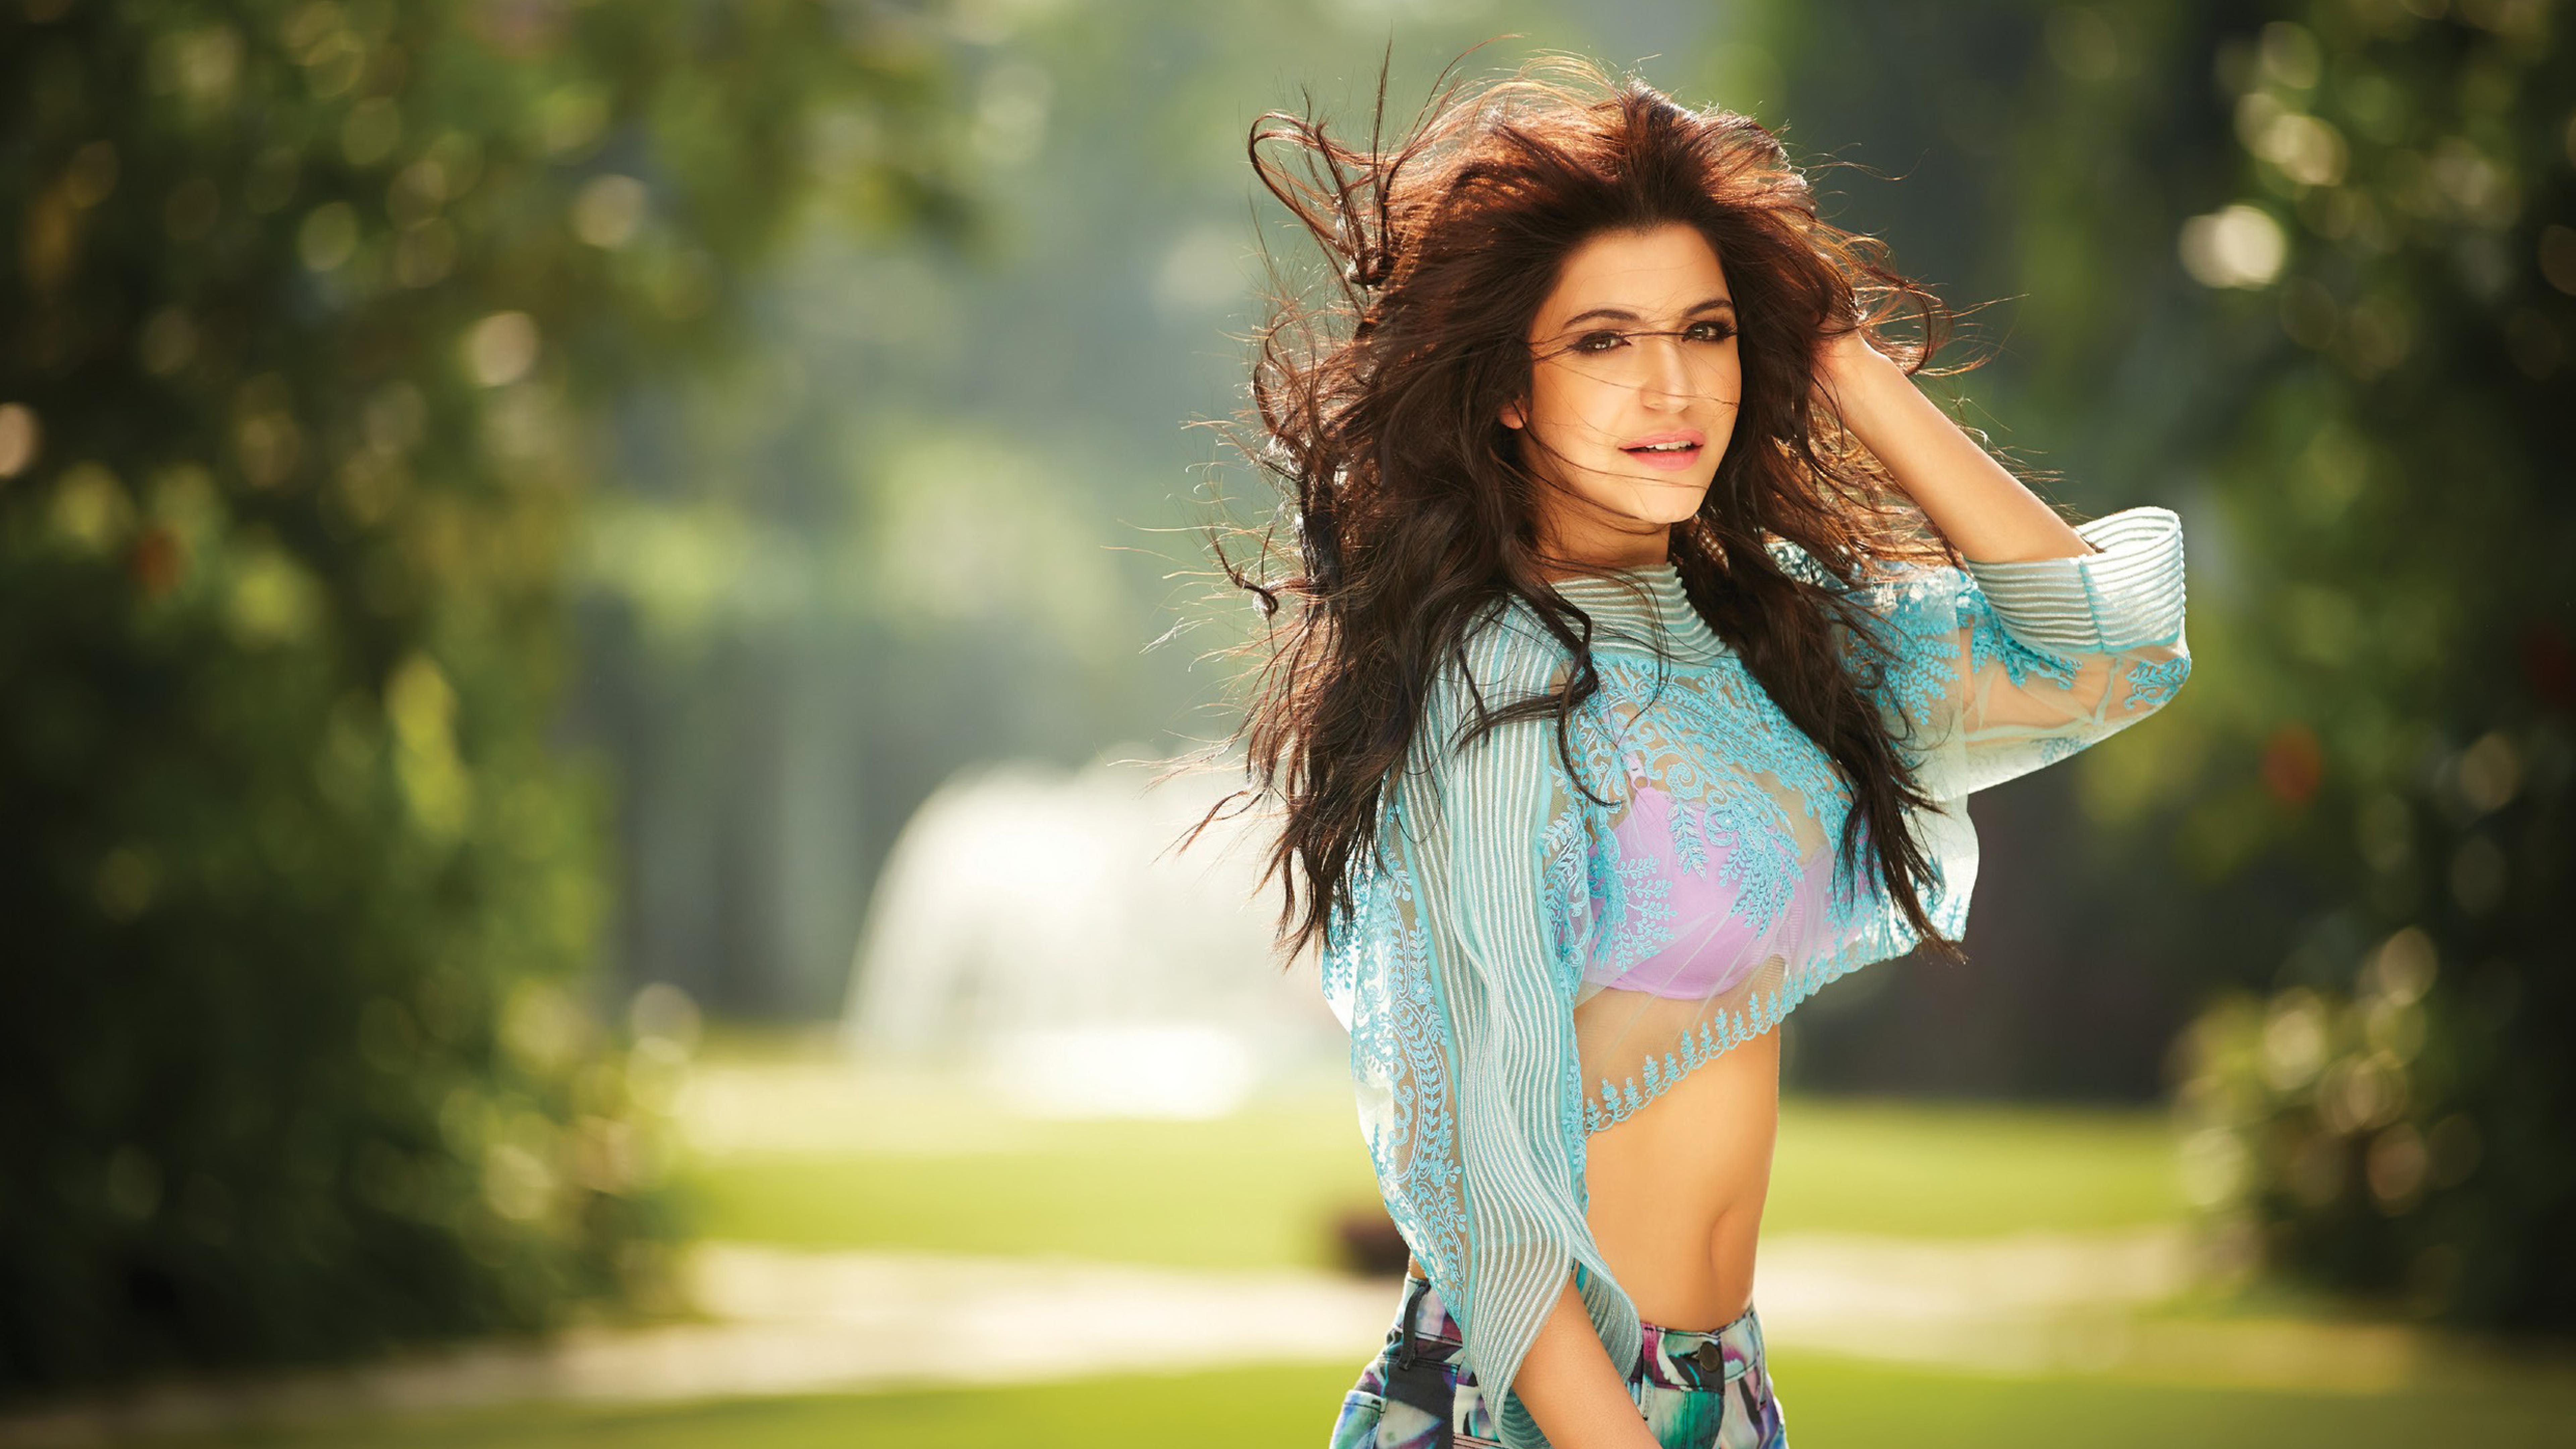 Anushka Sharma Sexy Photoshoot, Full Hd 2K Wallpaper-2326